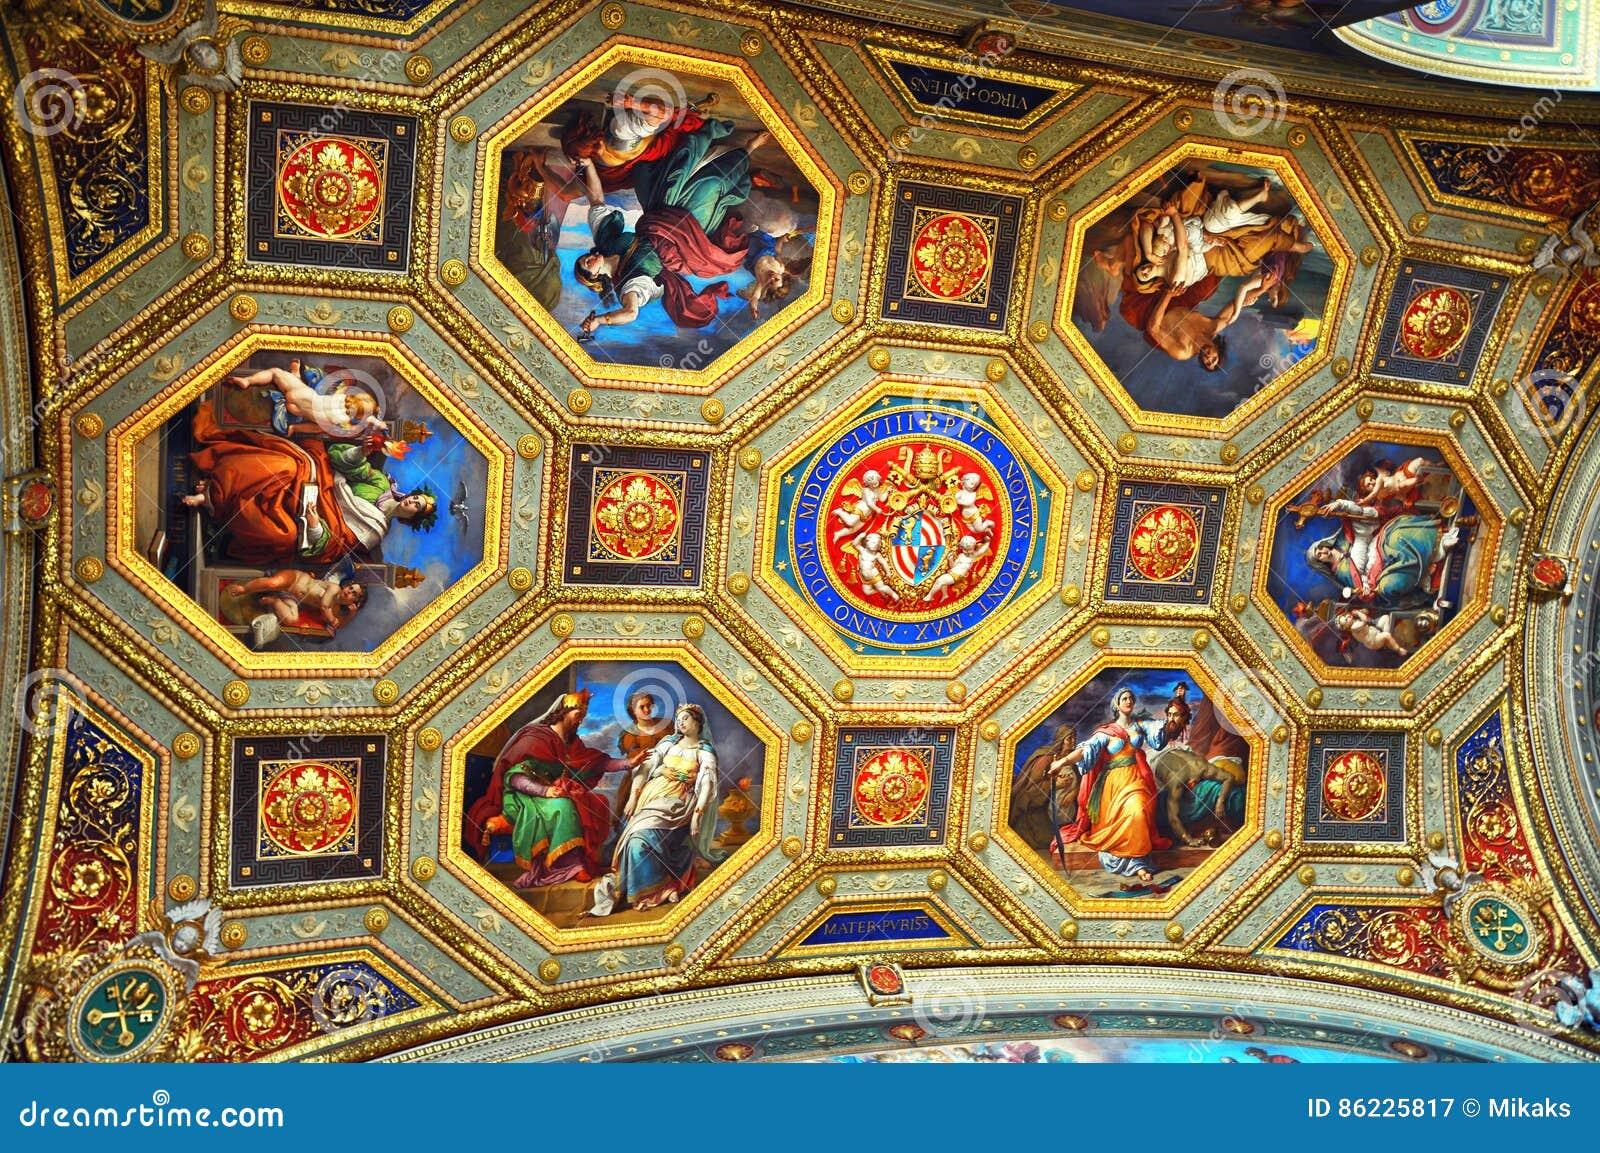 Vatican Museum Map Room Inside Ornate Sculptured Ceiling Editorial on laumeier sculpture park map, forest park map, st louis science center map, airport map, navy pier map, soulard neighborhood map, saint louis university map, scottrade center map,